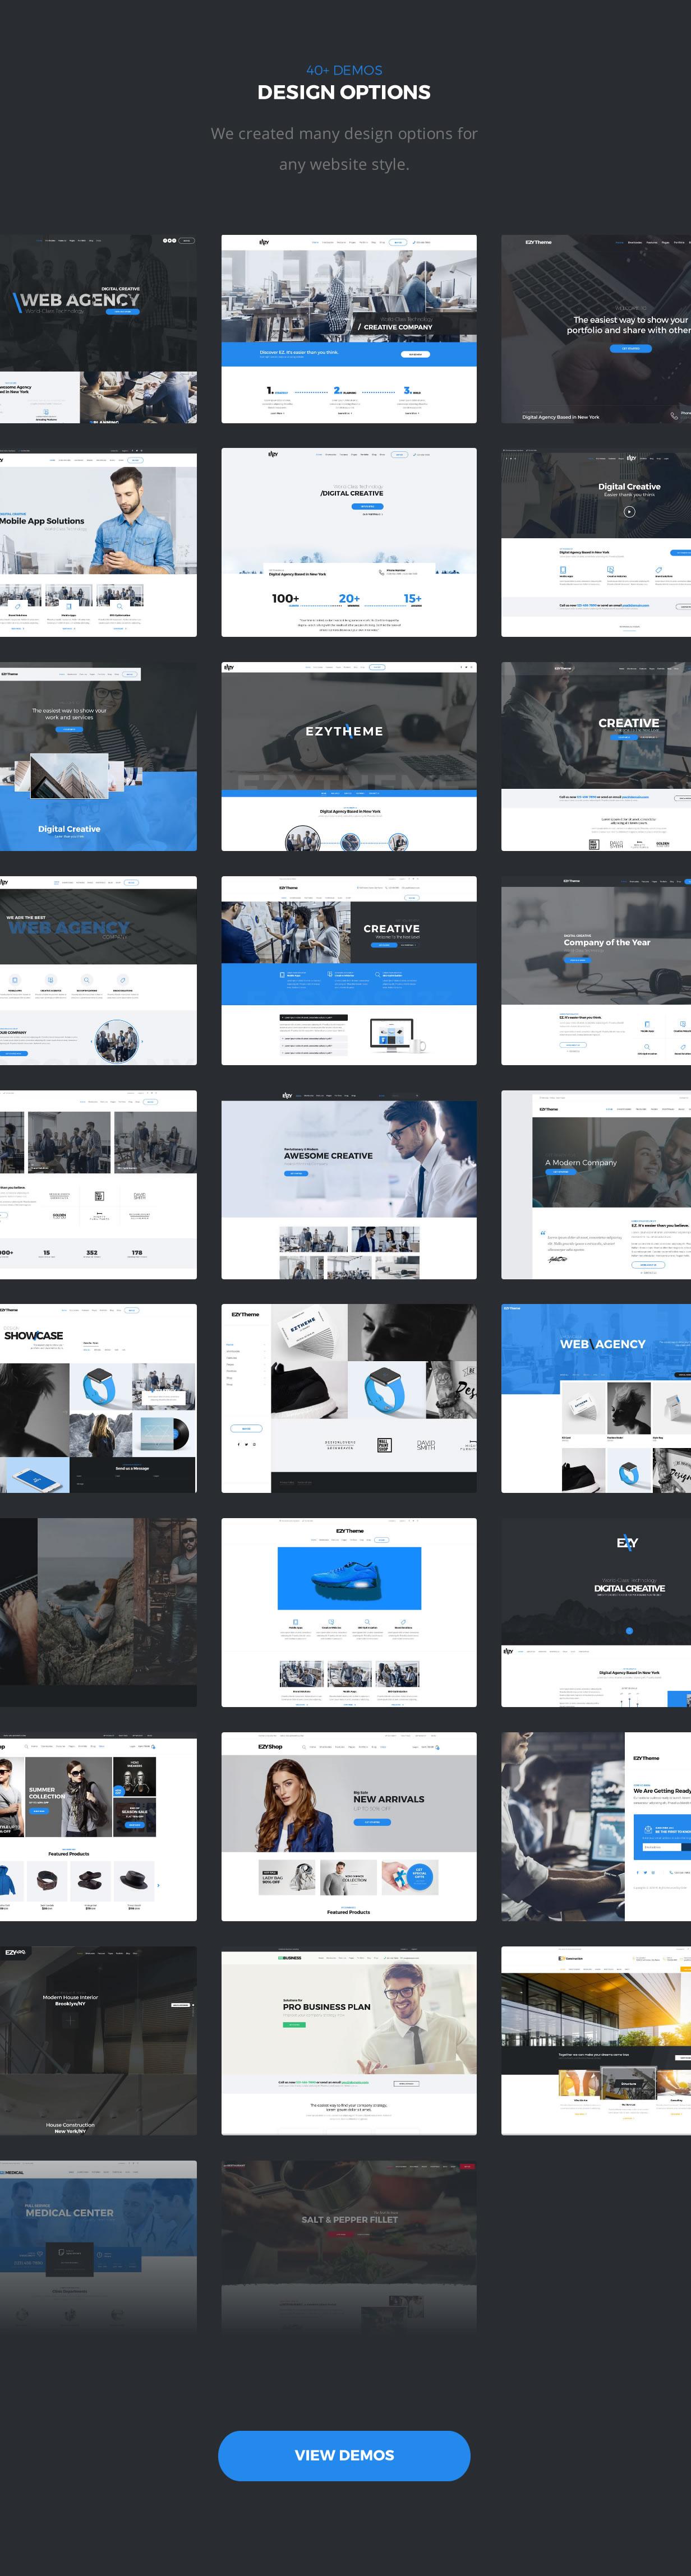 EZY - Responsive Multi-Purpose WordPress Theme - 3